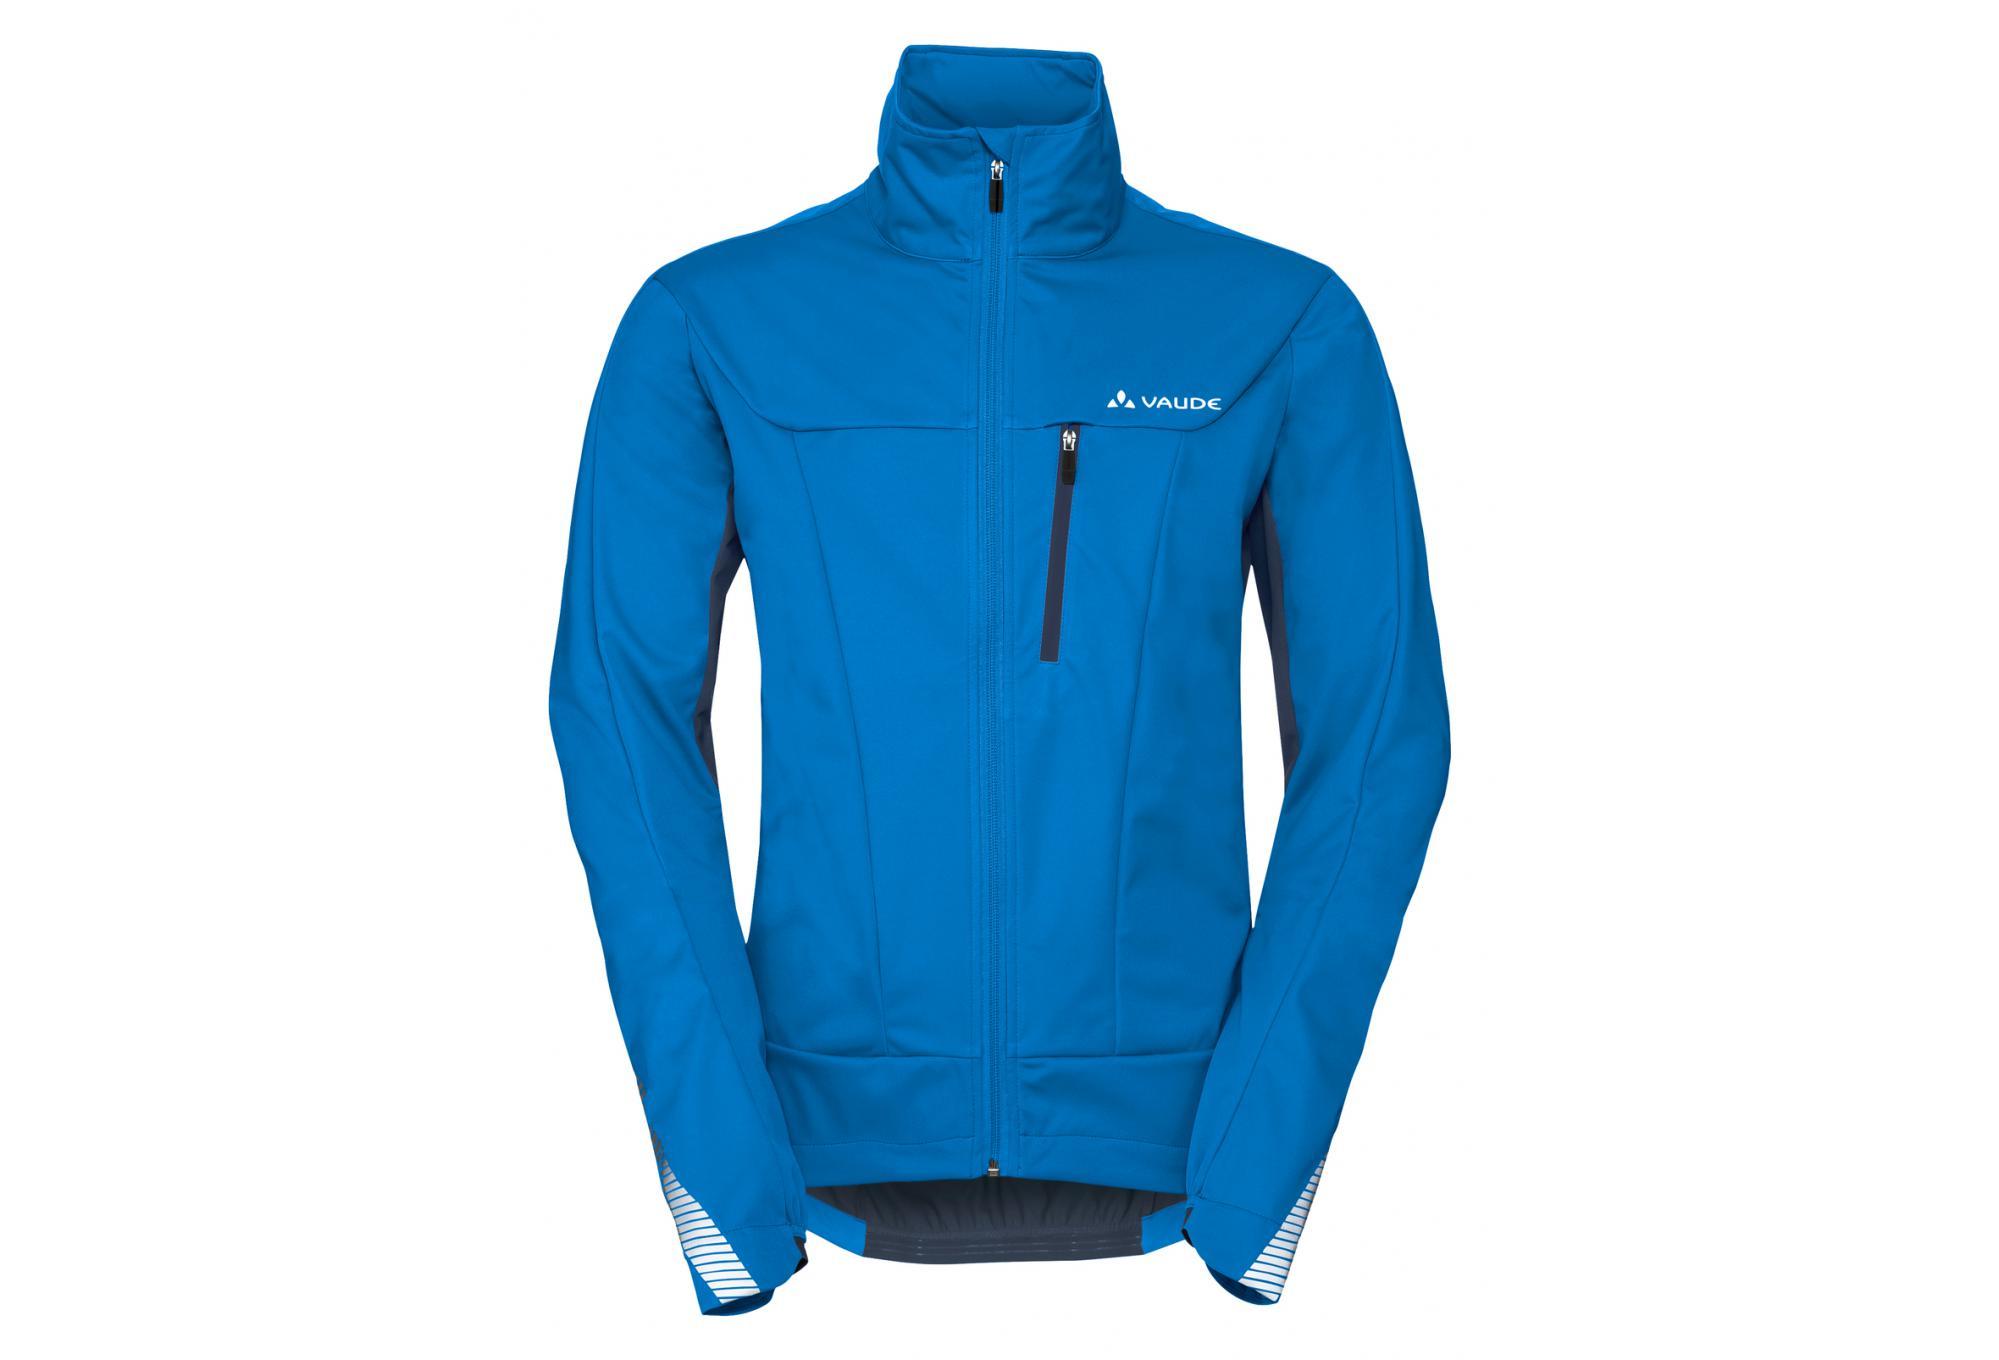 size 40 bca89 1d2c9 Vaude Steglio Softshell Jacket